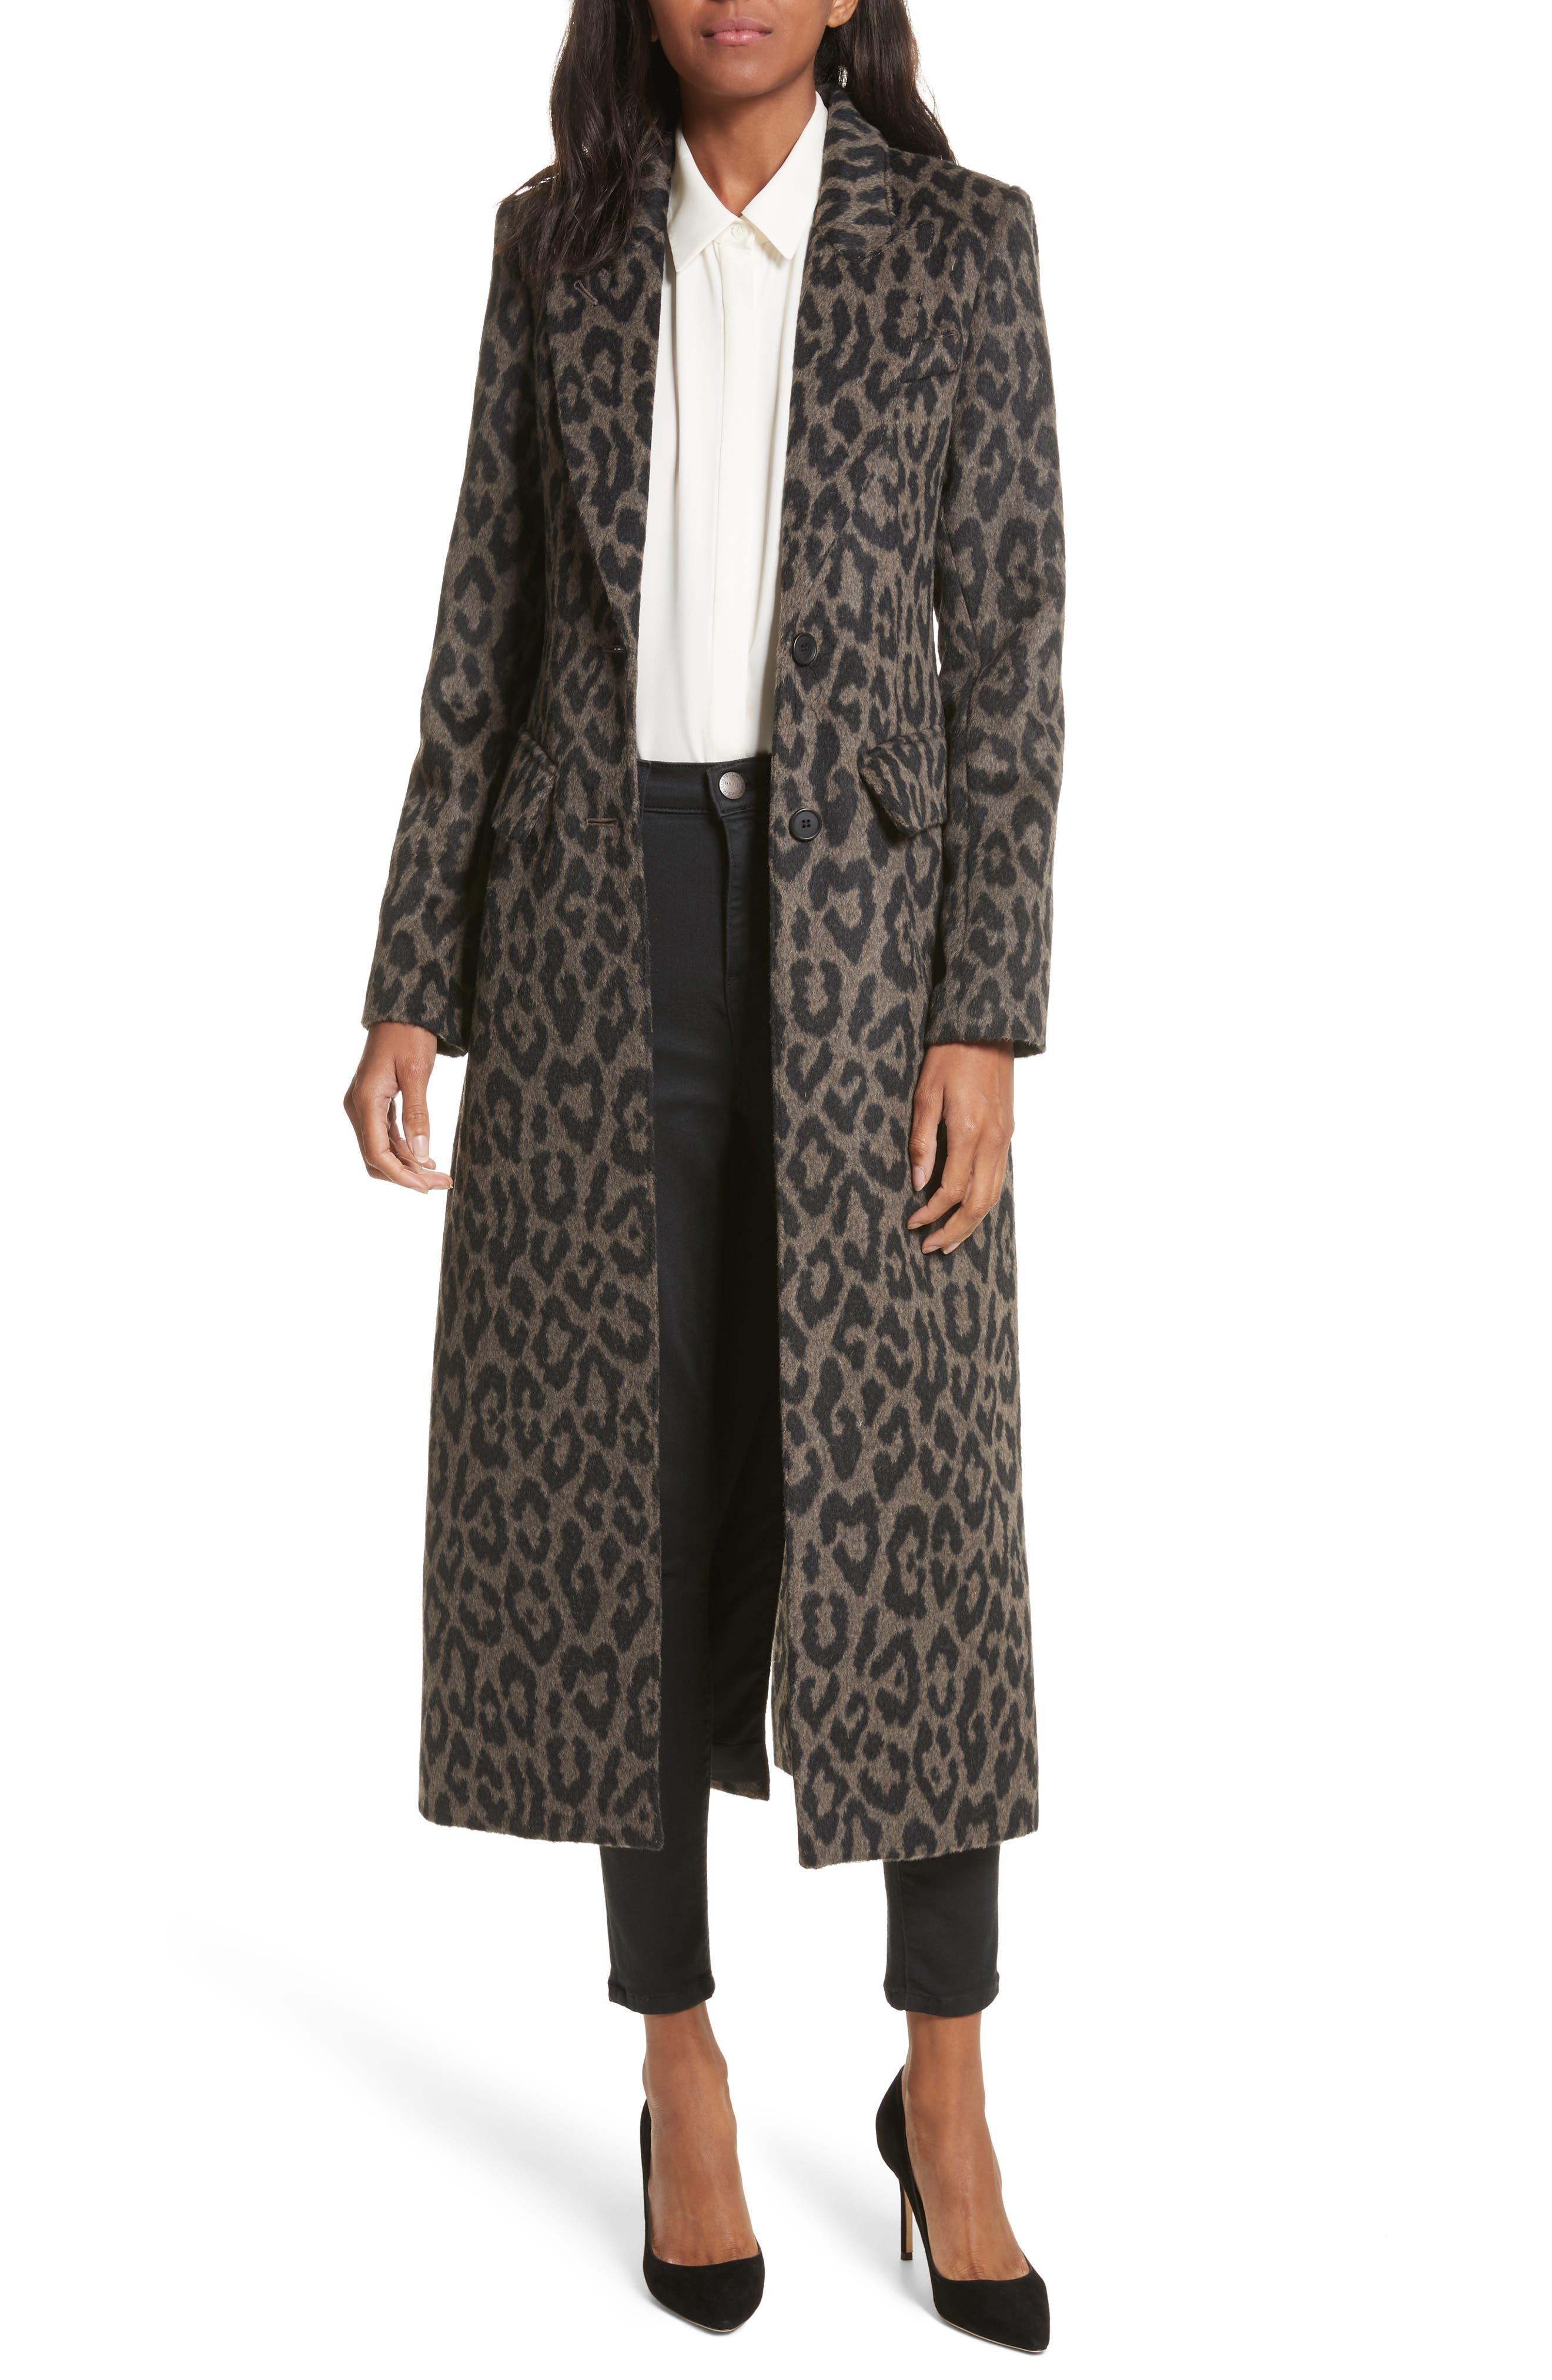 Smythe Brando Alpaca & Wool Coat